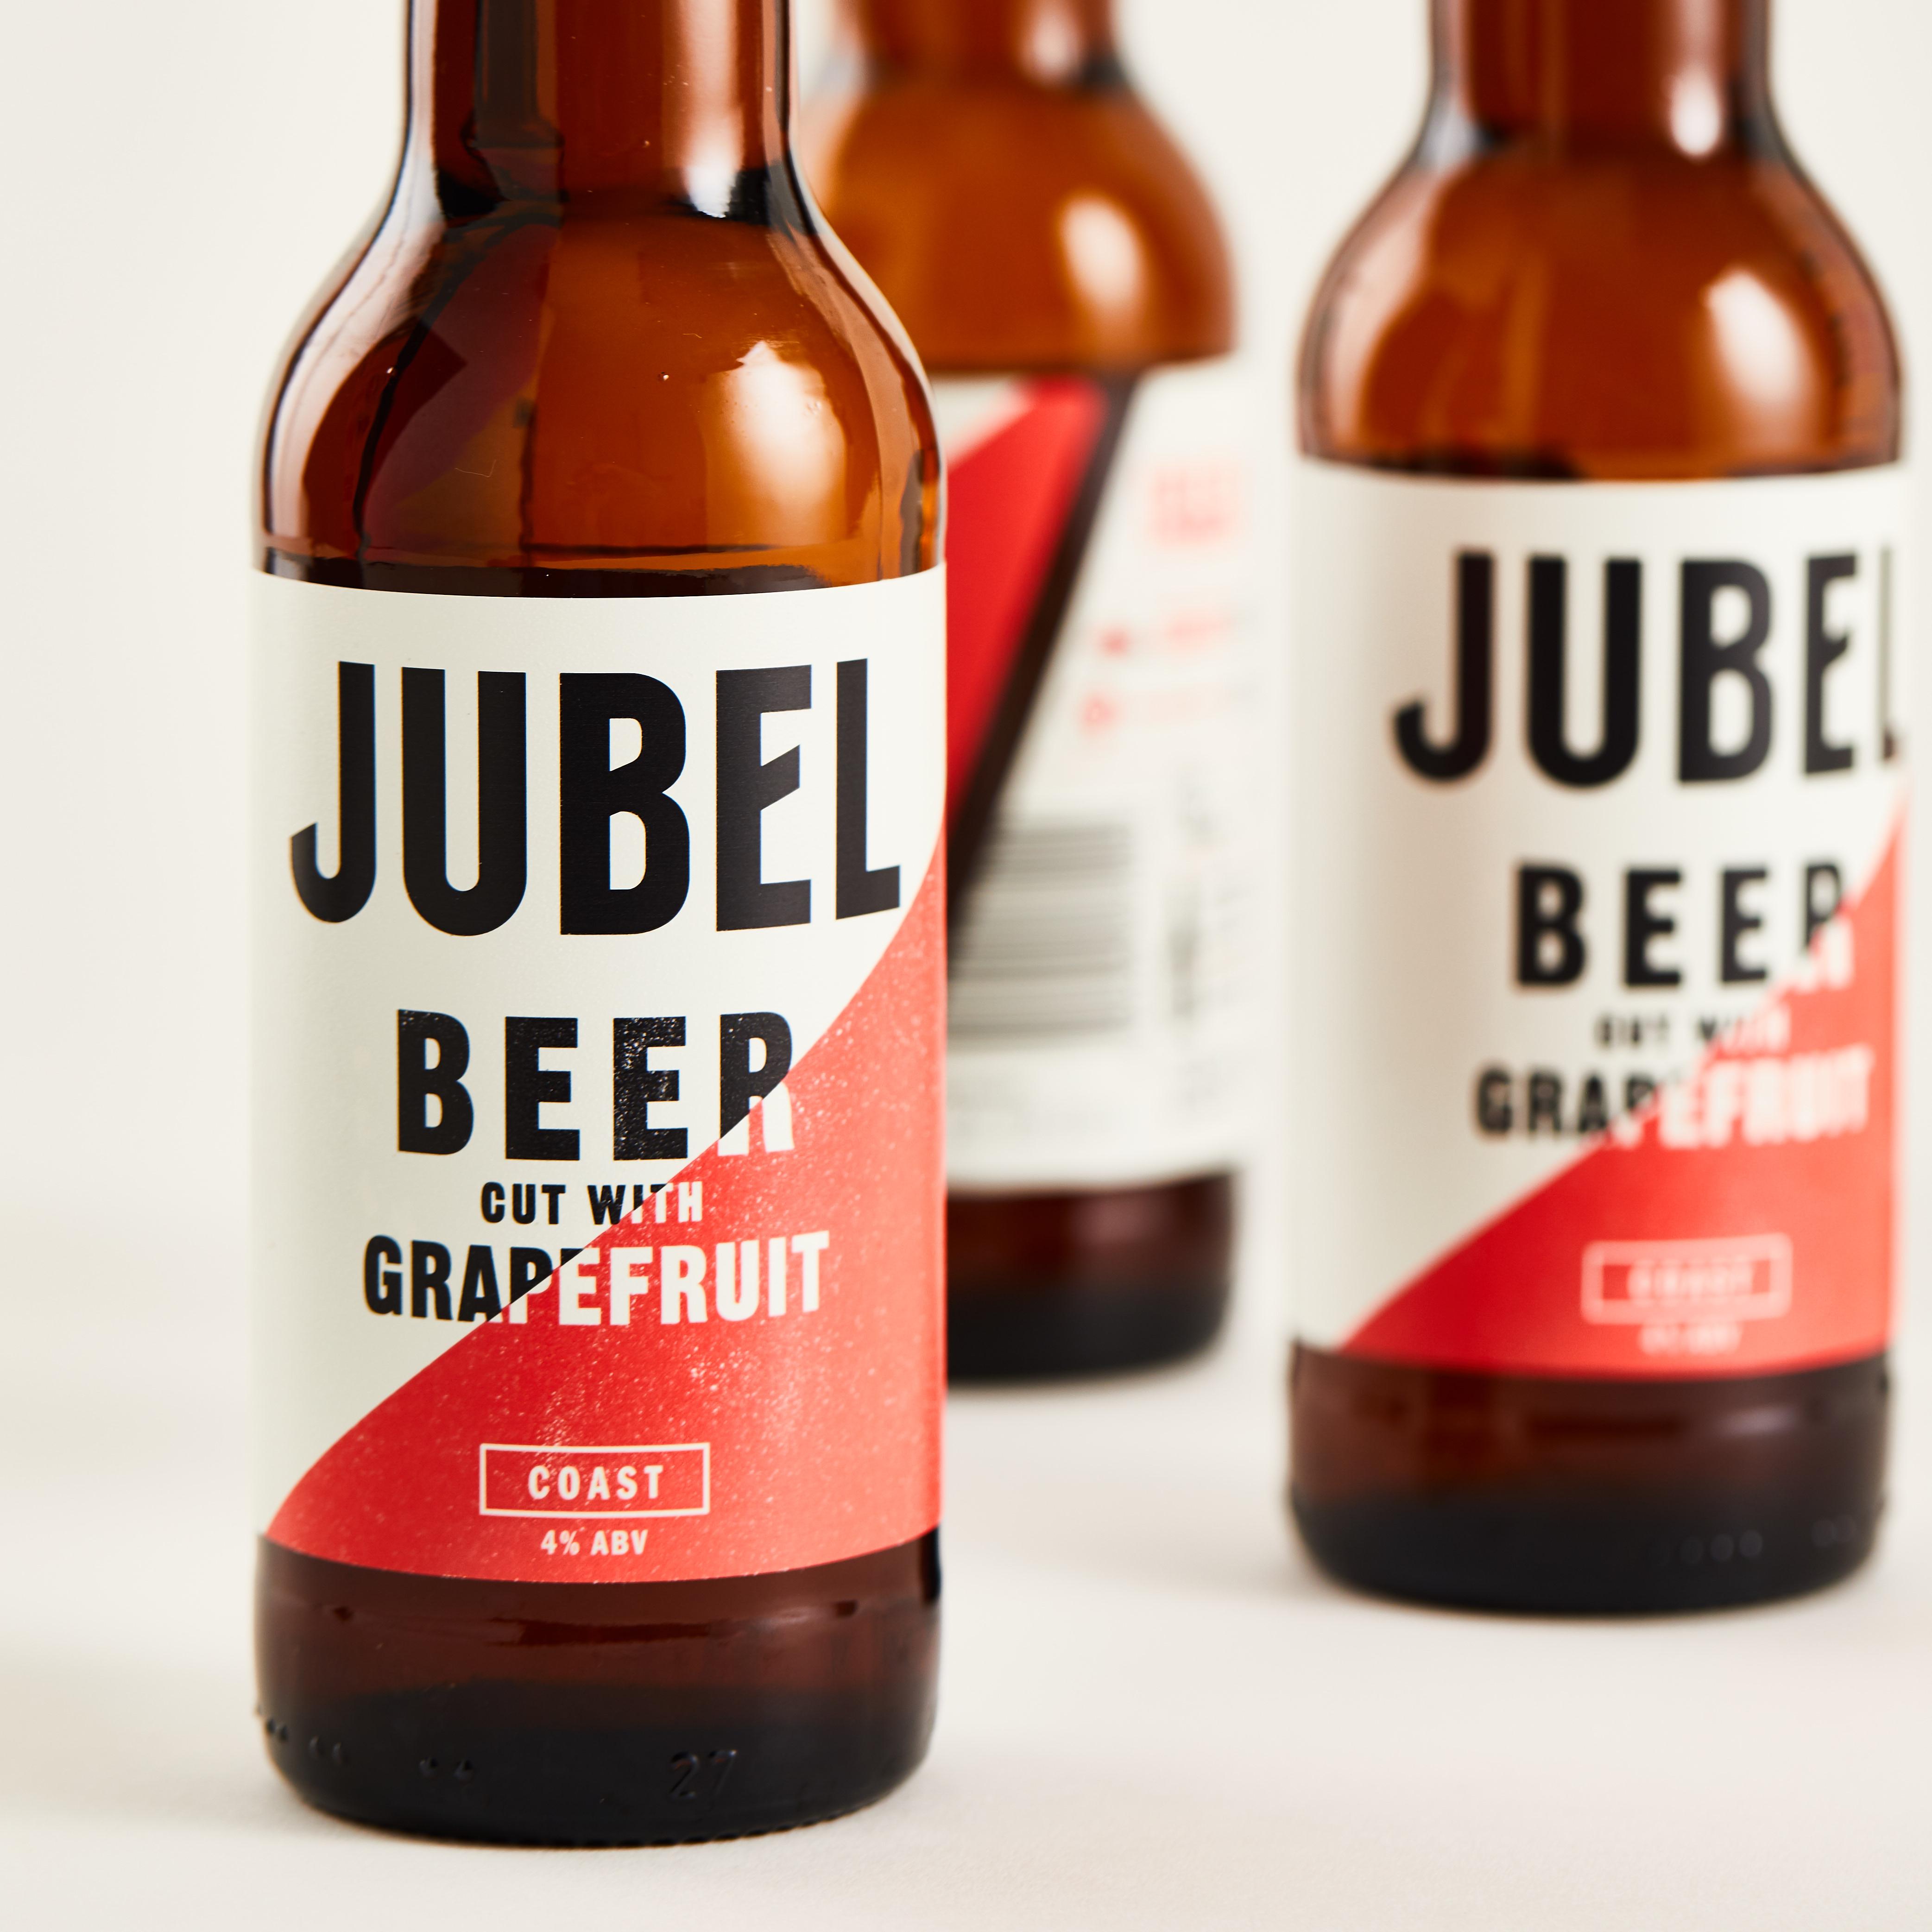 Jubel eco-responsible beer launches 2018